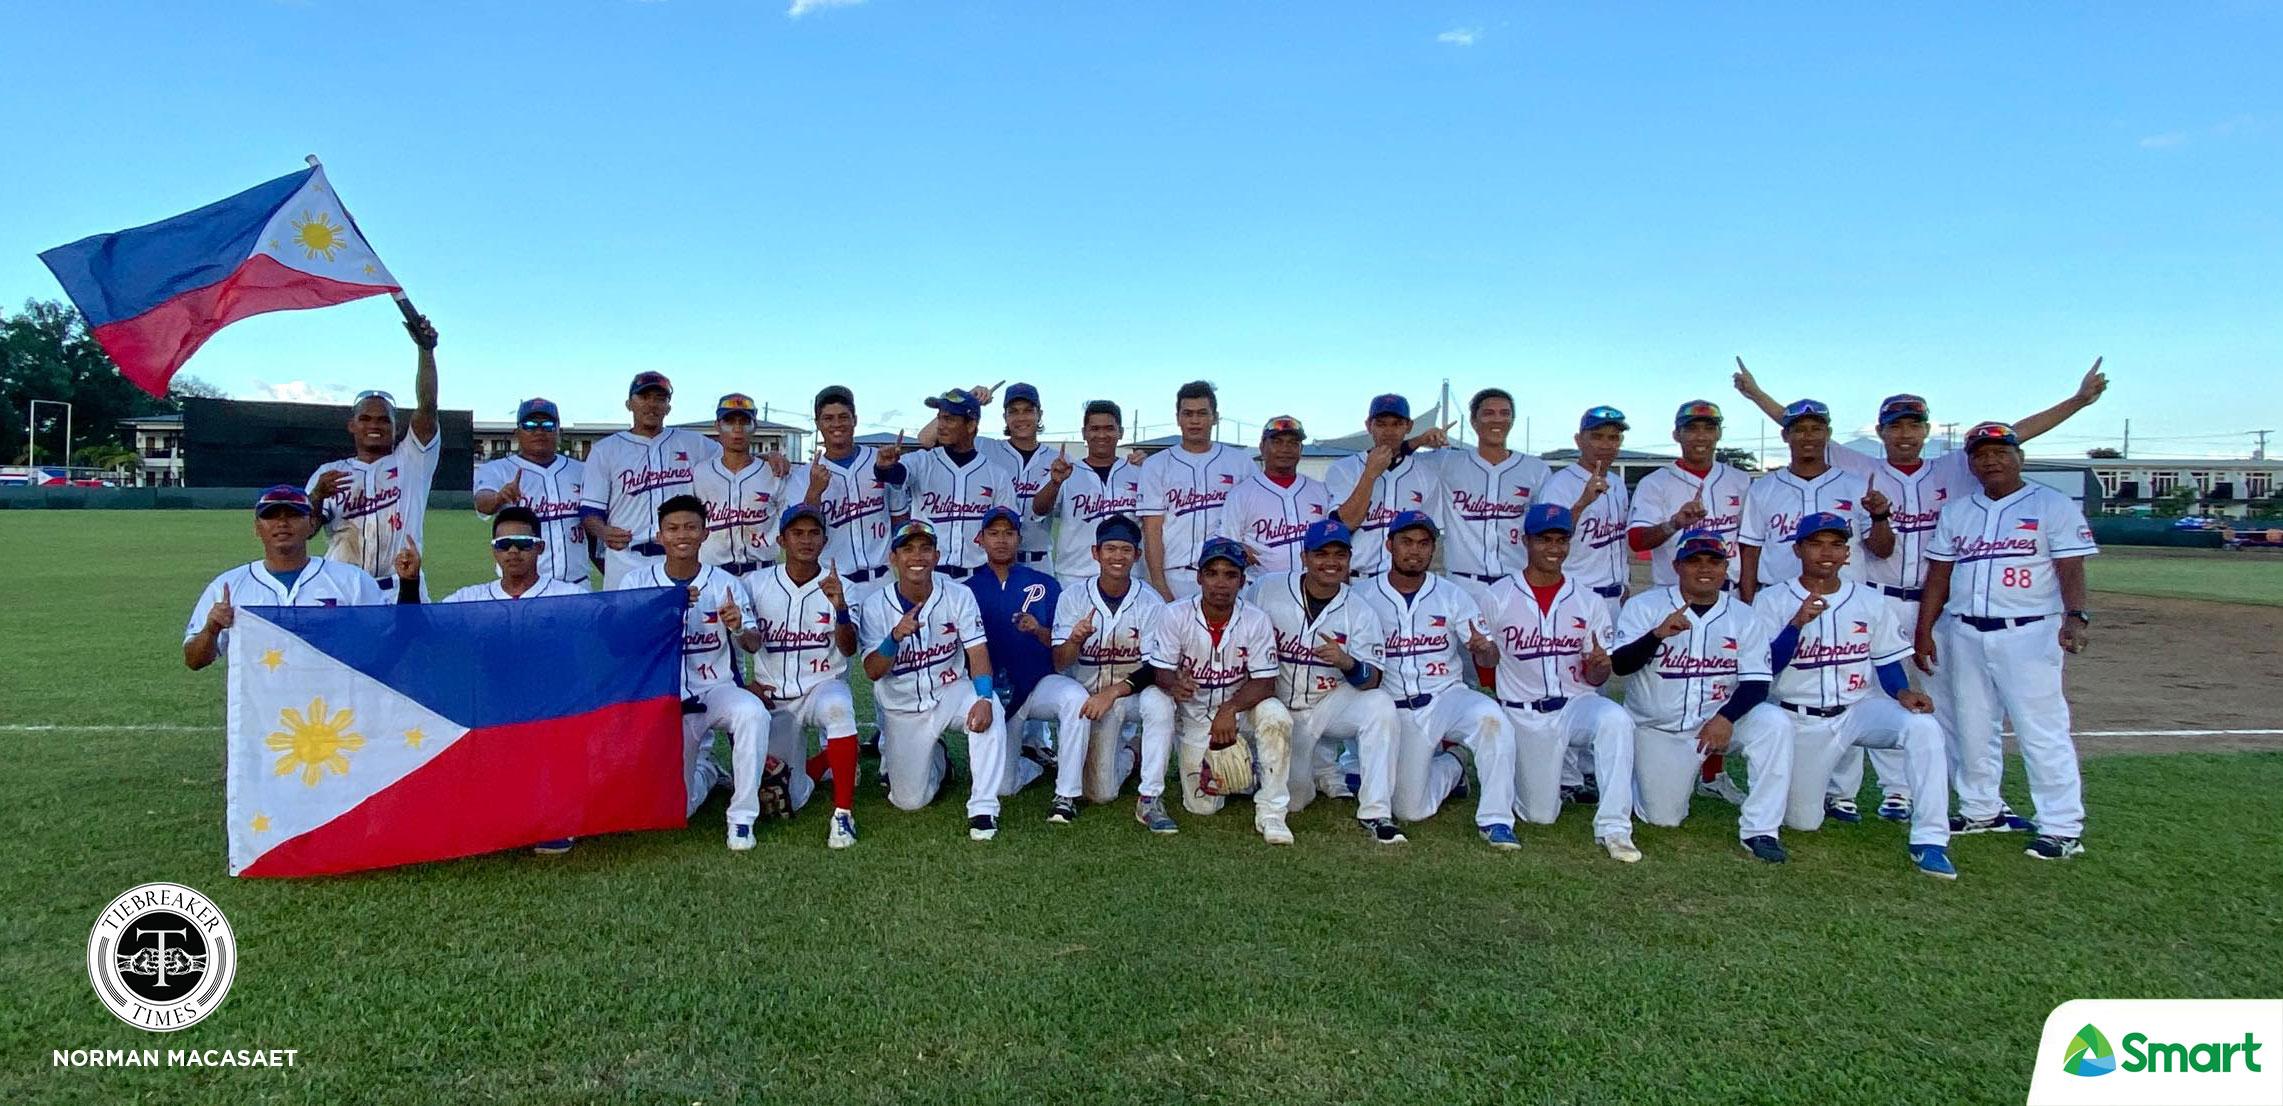 Tiebreaker Times PH Baseball remains king of SEAG 2019 SEA Games Baseball News  Thailand (Baseball) Philippine Men's National Baseball Team Orlando Binarao Kiko Gesmundo 2019 SEA Games - Baseball 2019 SEA Games